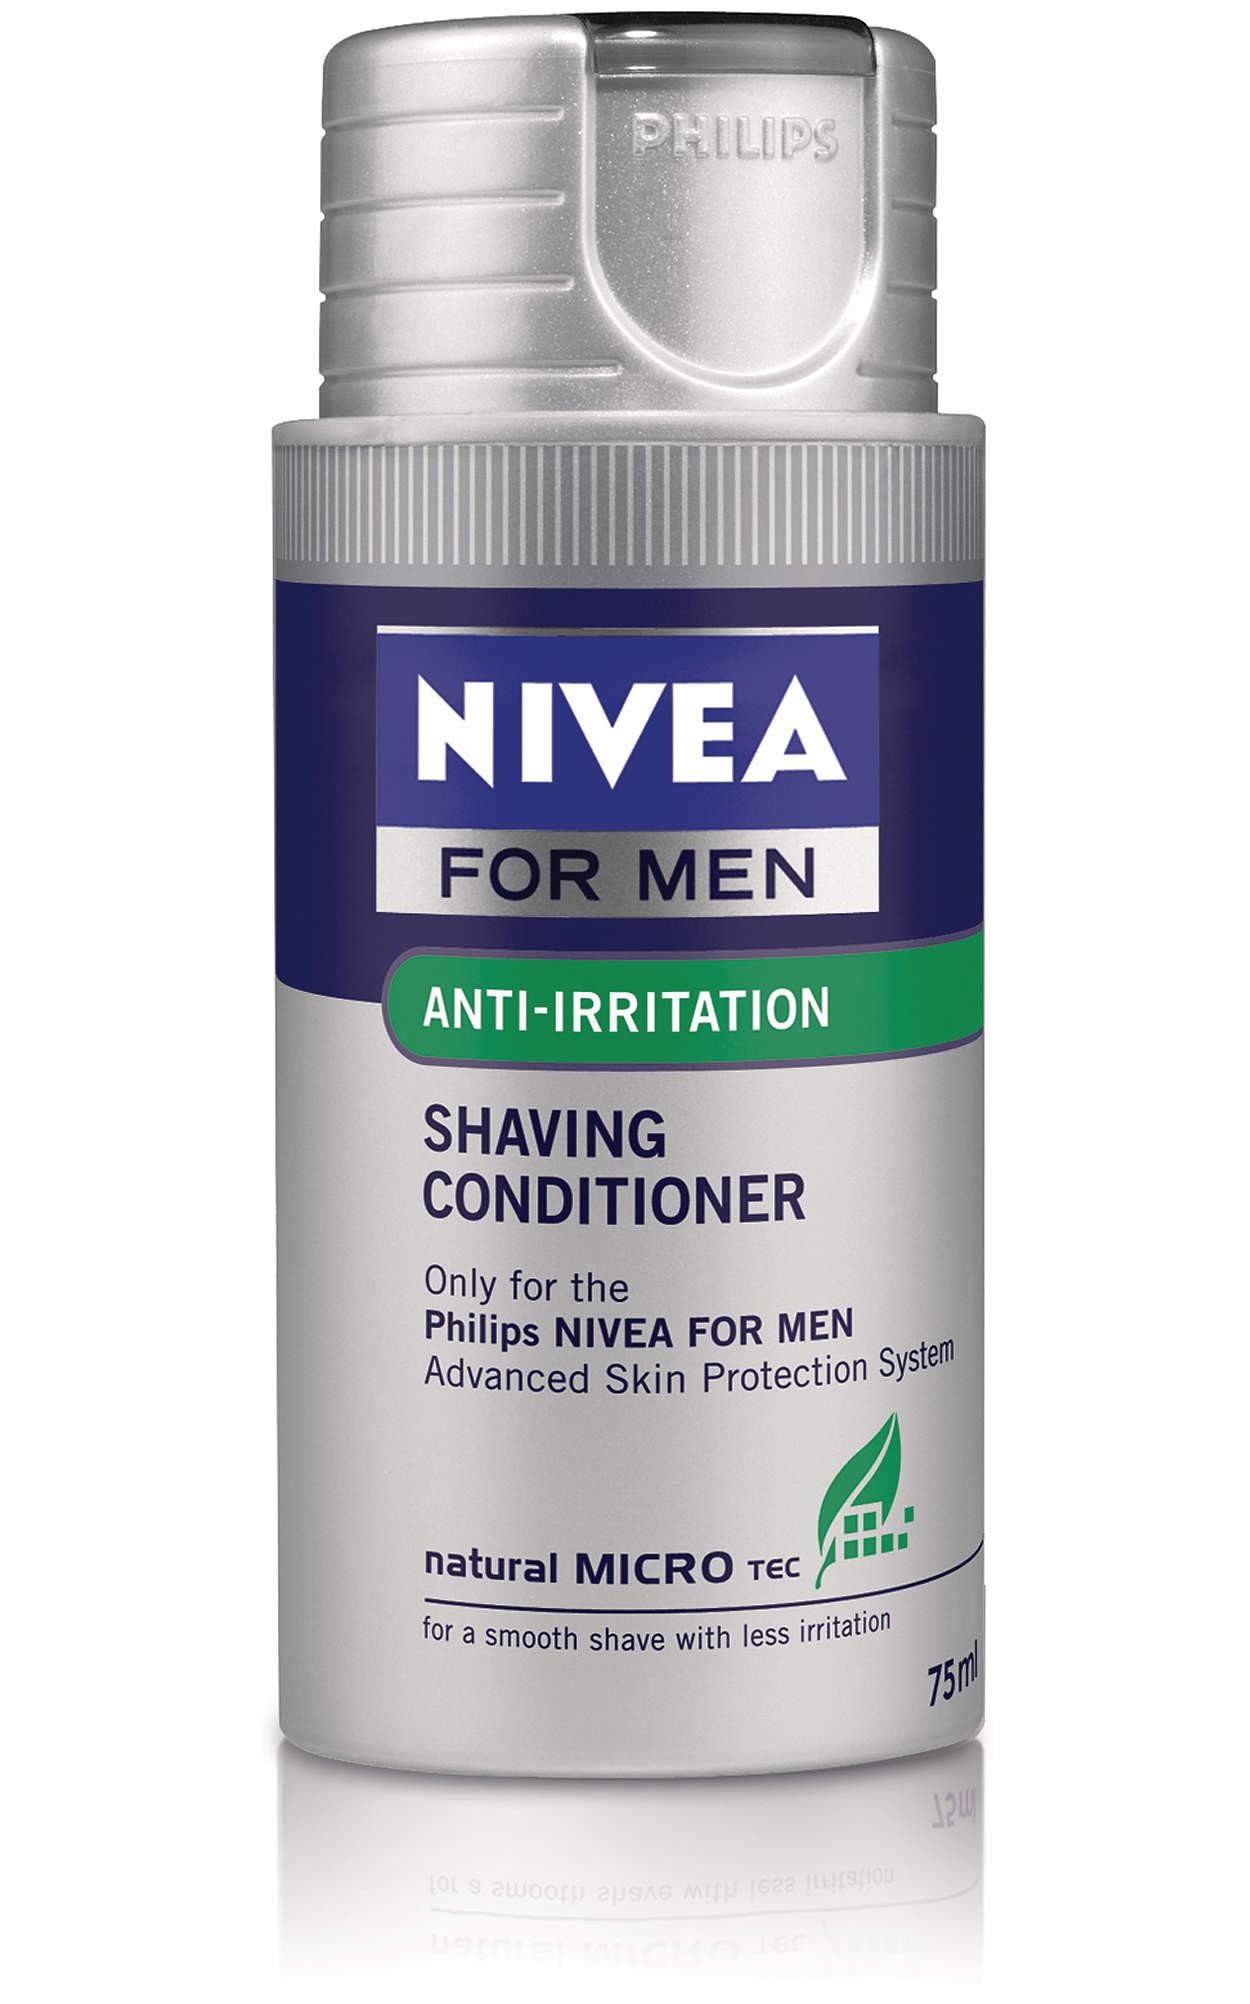 Moisturising shaving conditioner